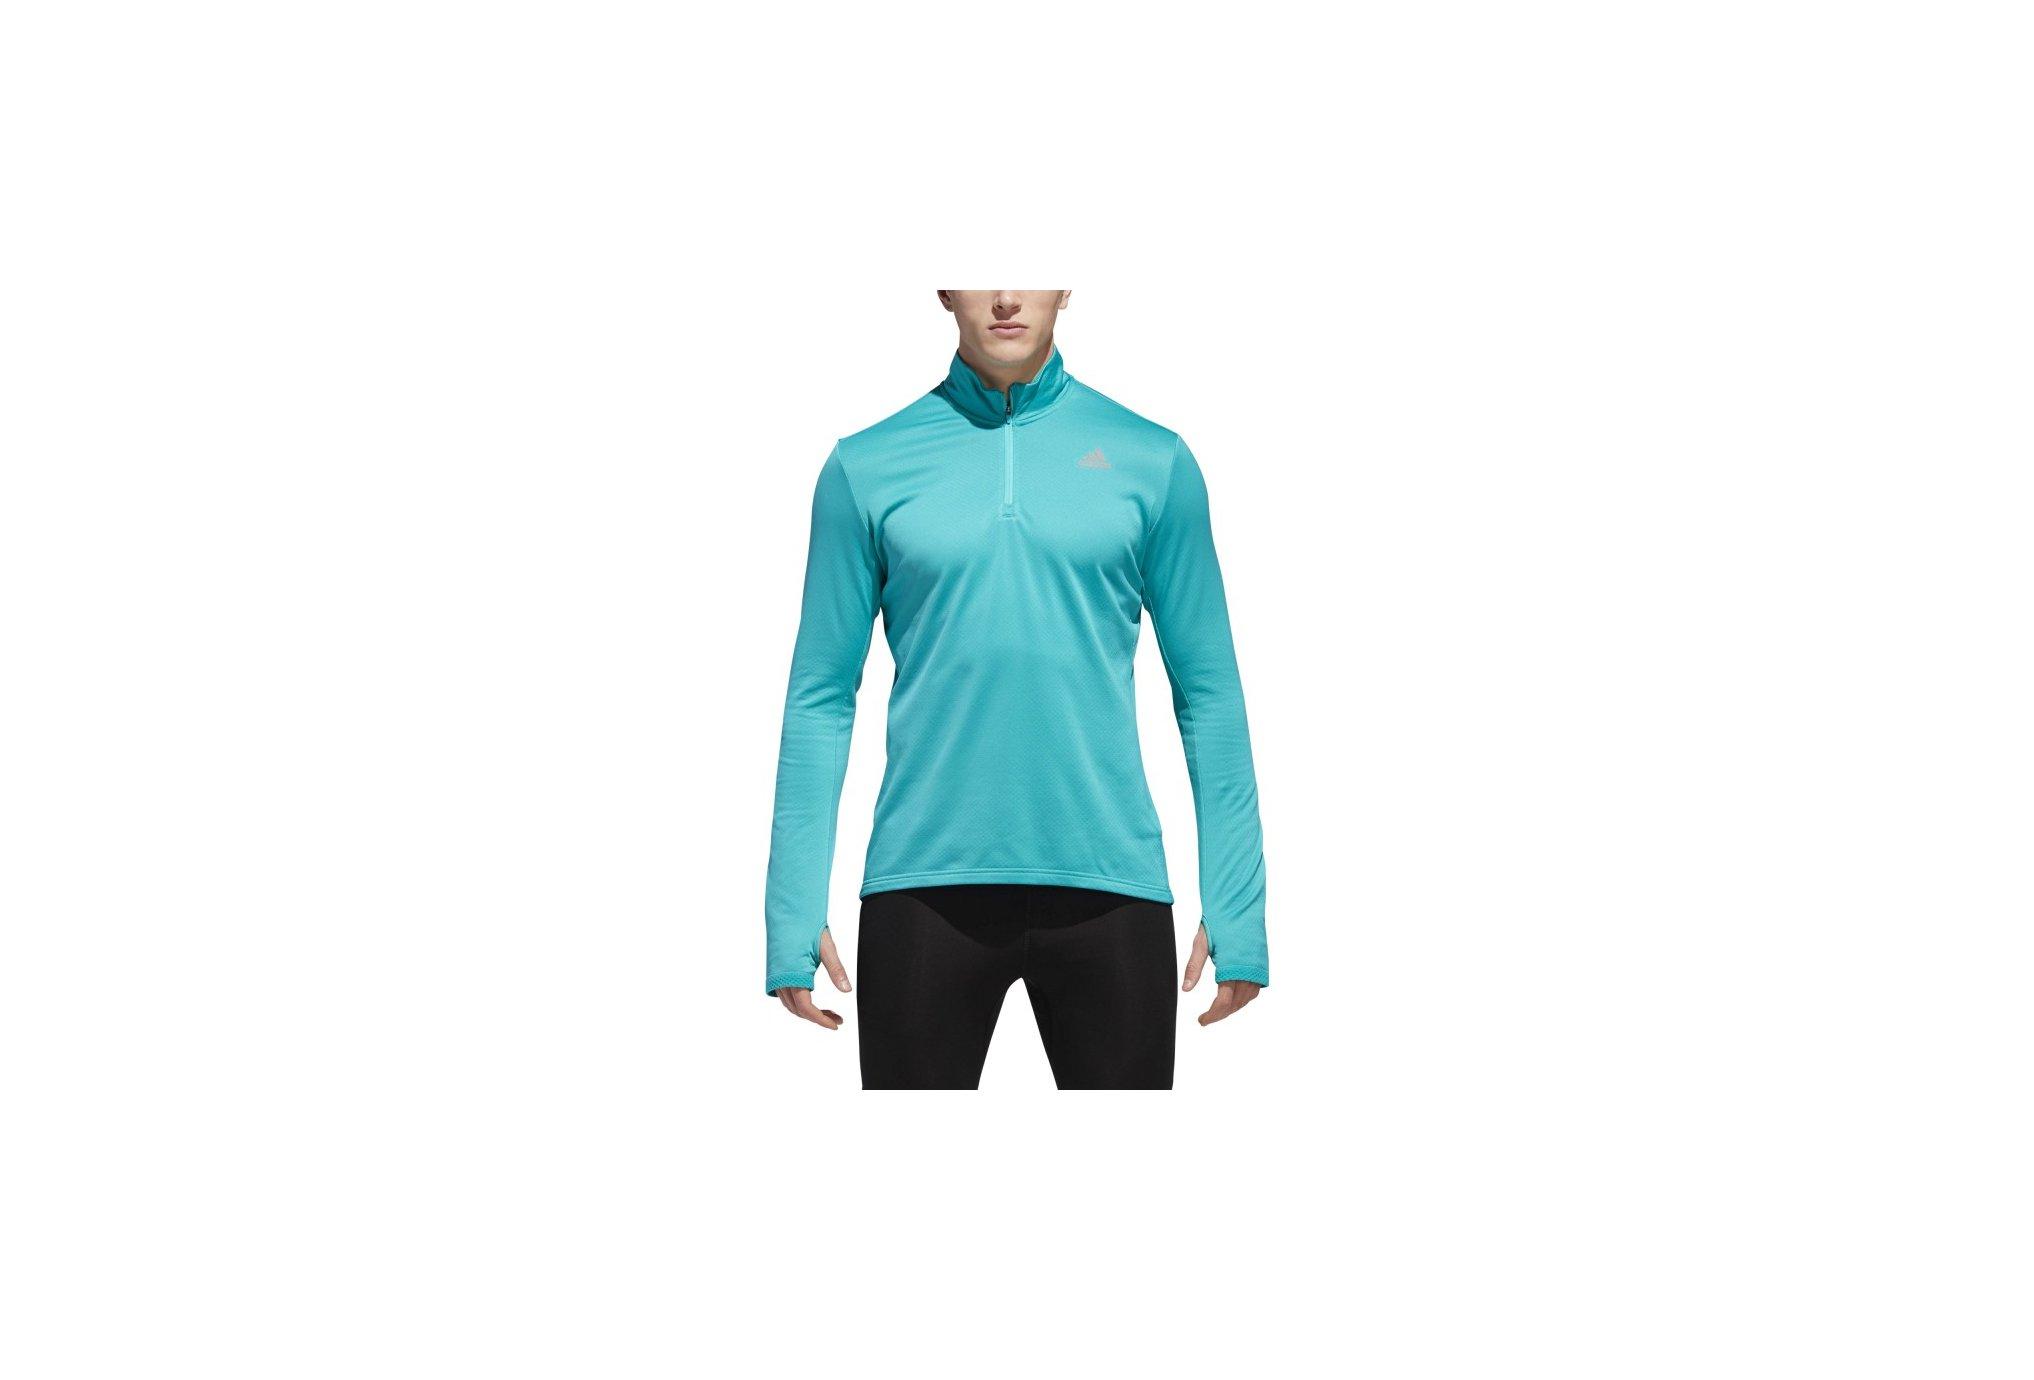 Adidas Response climawarm m vêtement running homme